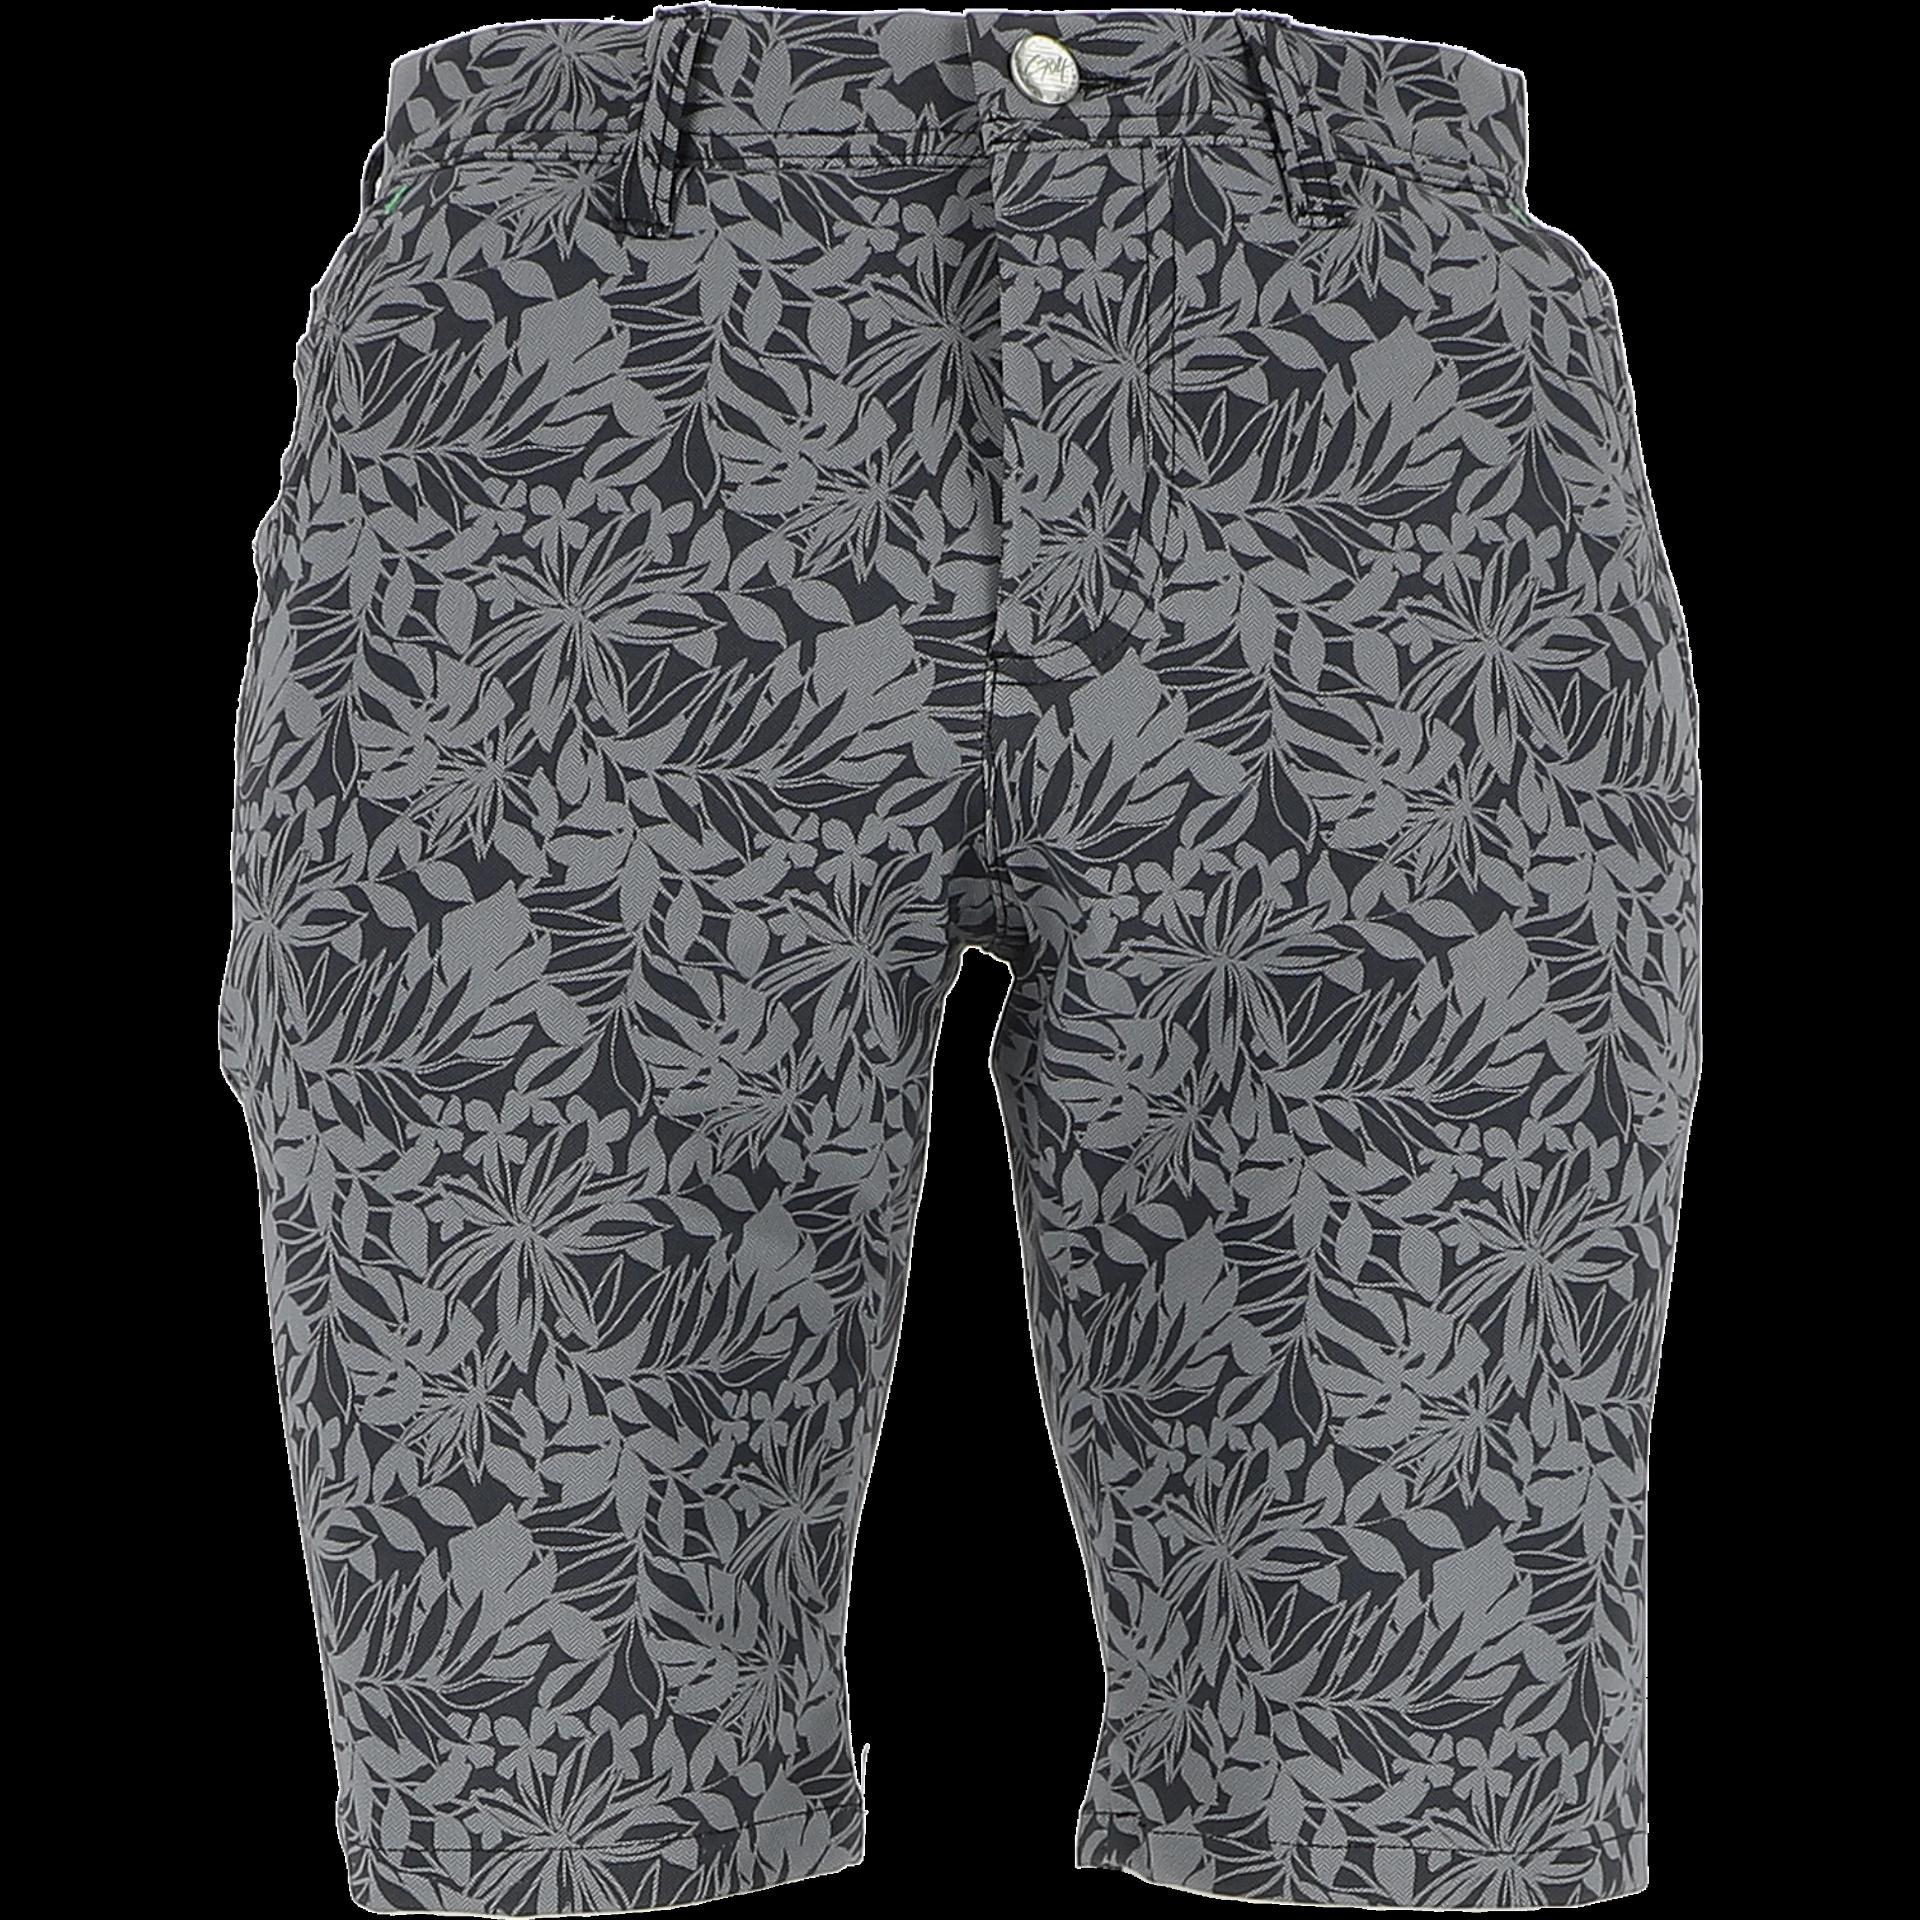 EARNIE Shorts - WR Revolutional Flowers